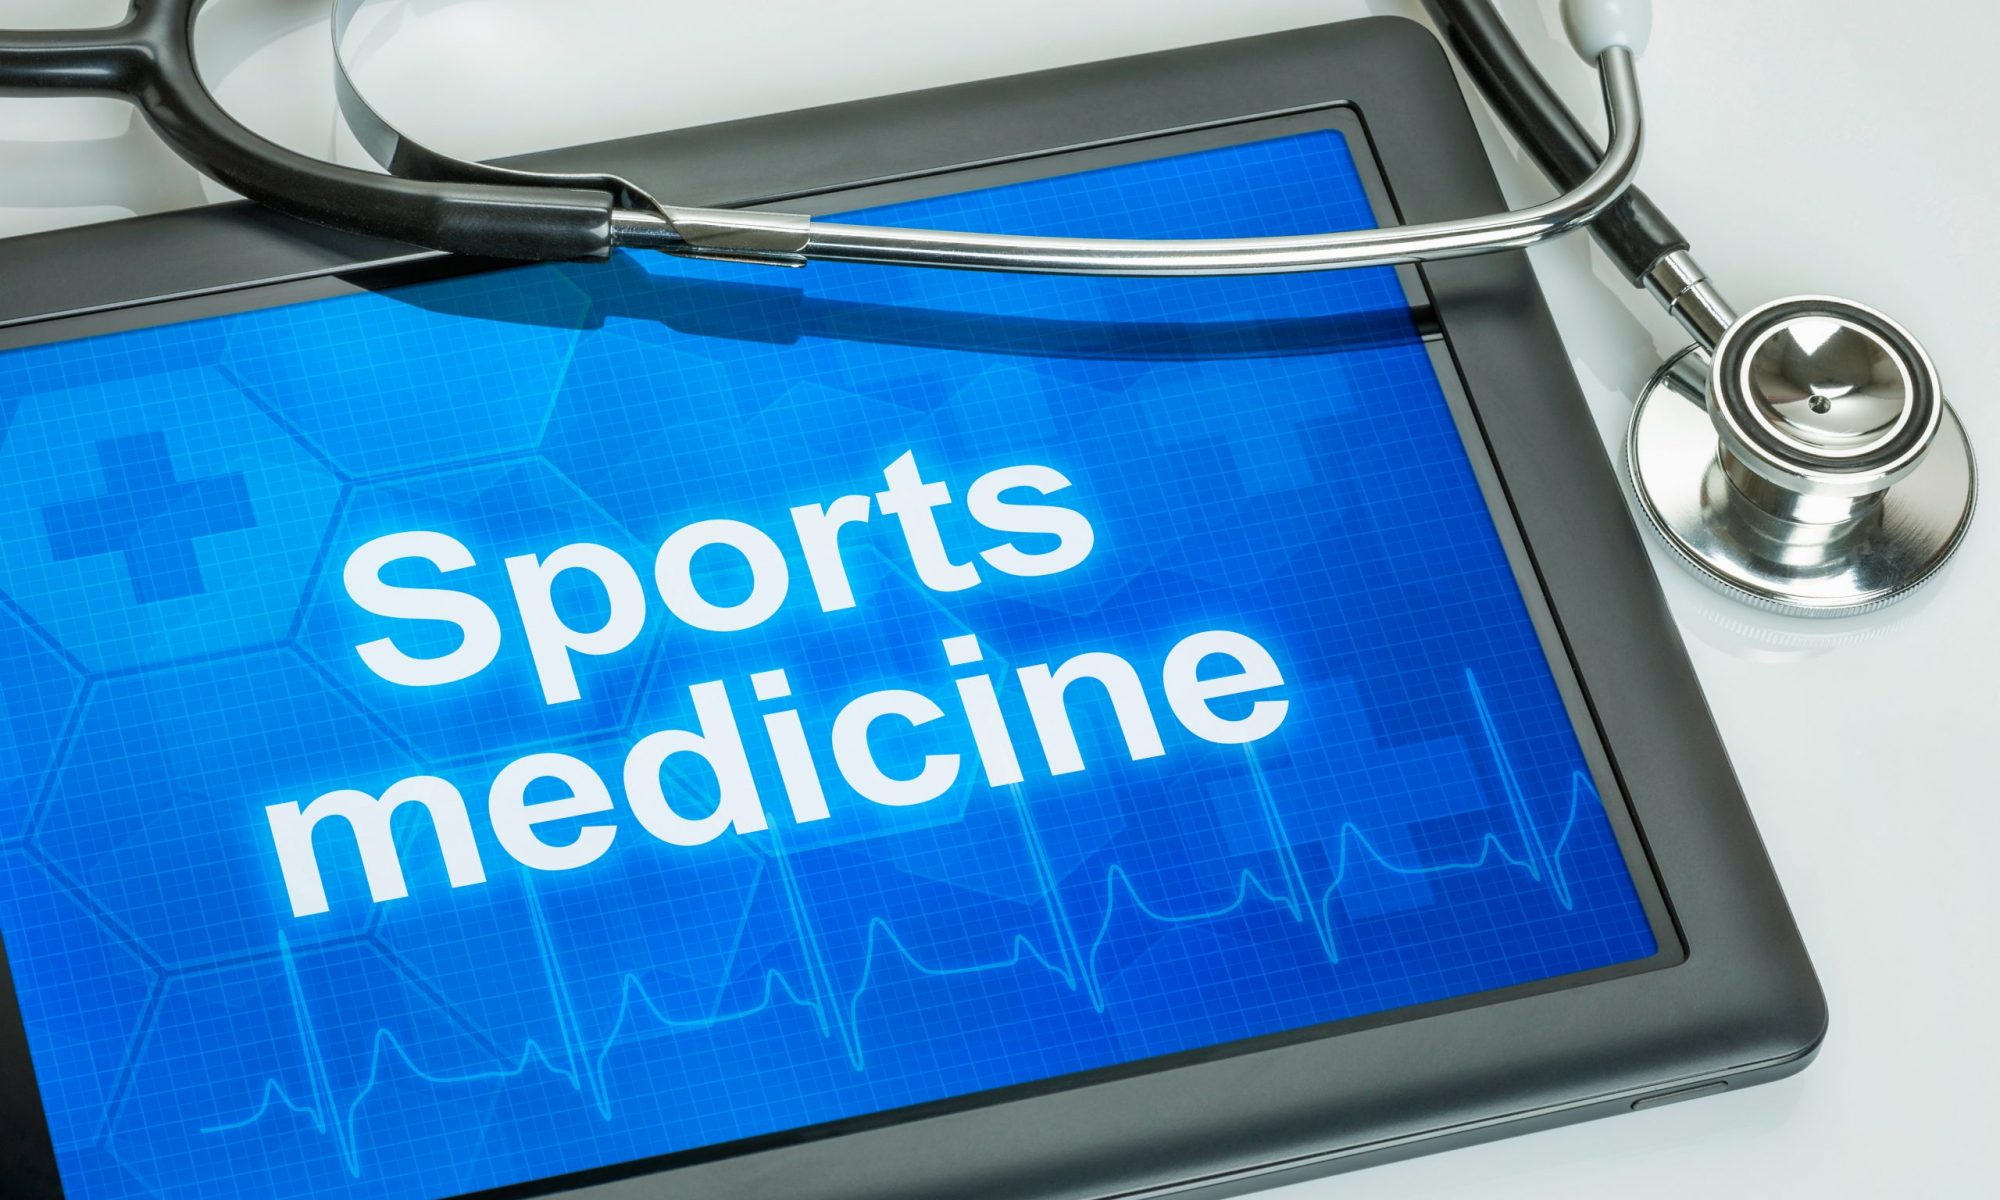 eSports Medicine